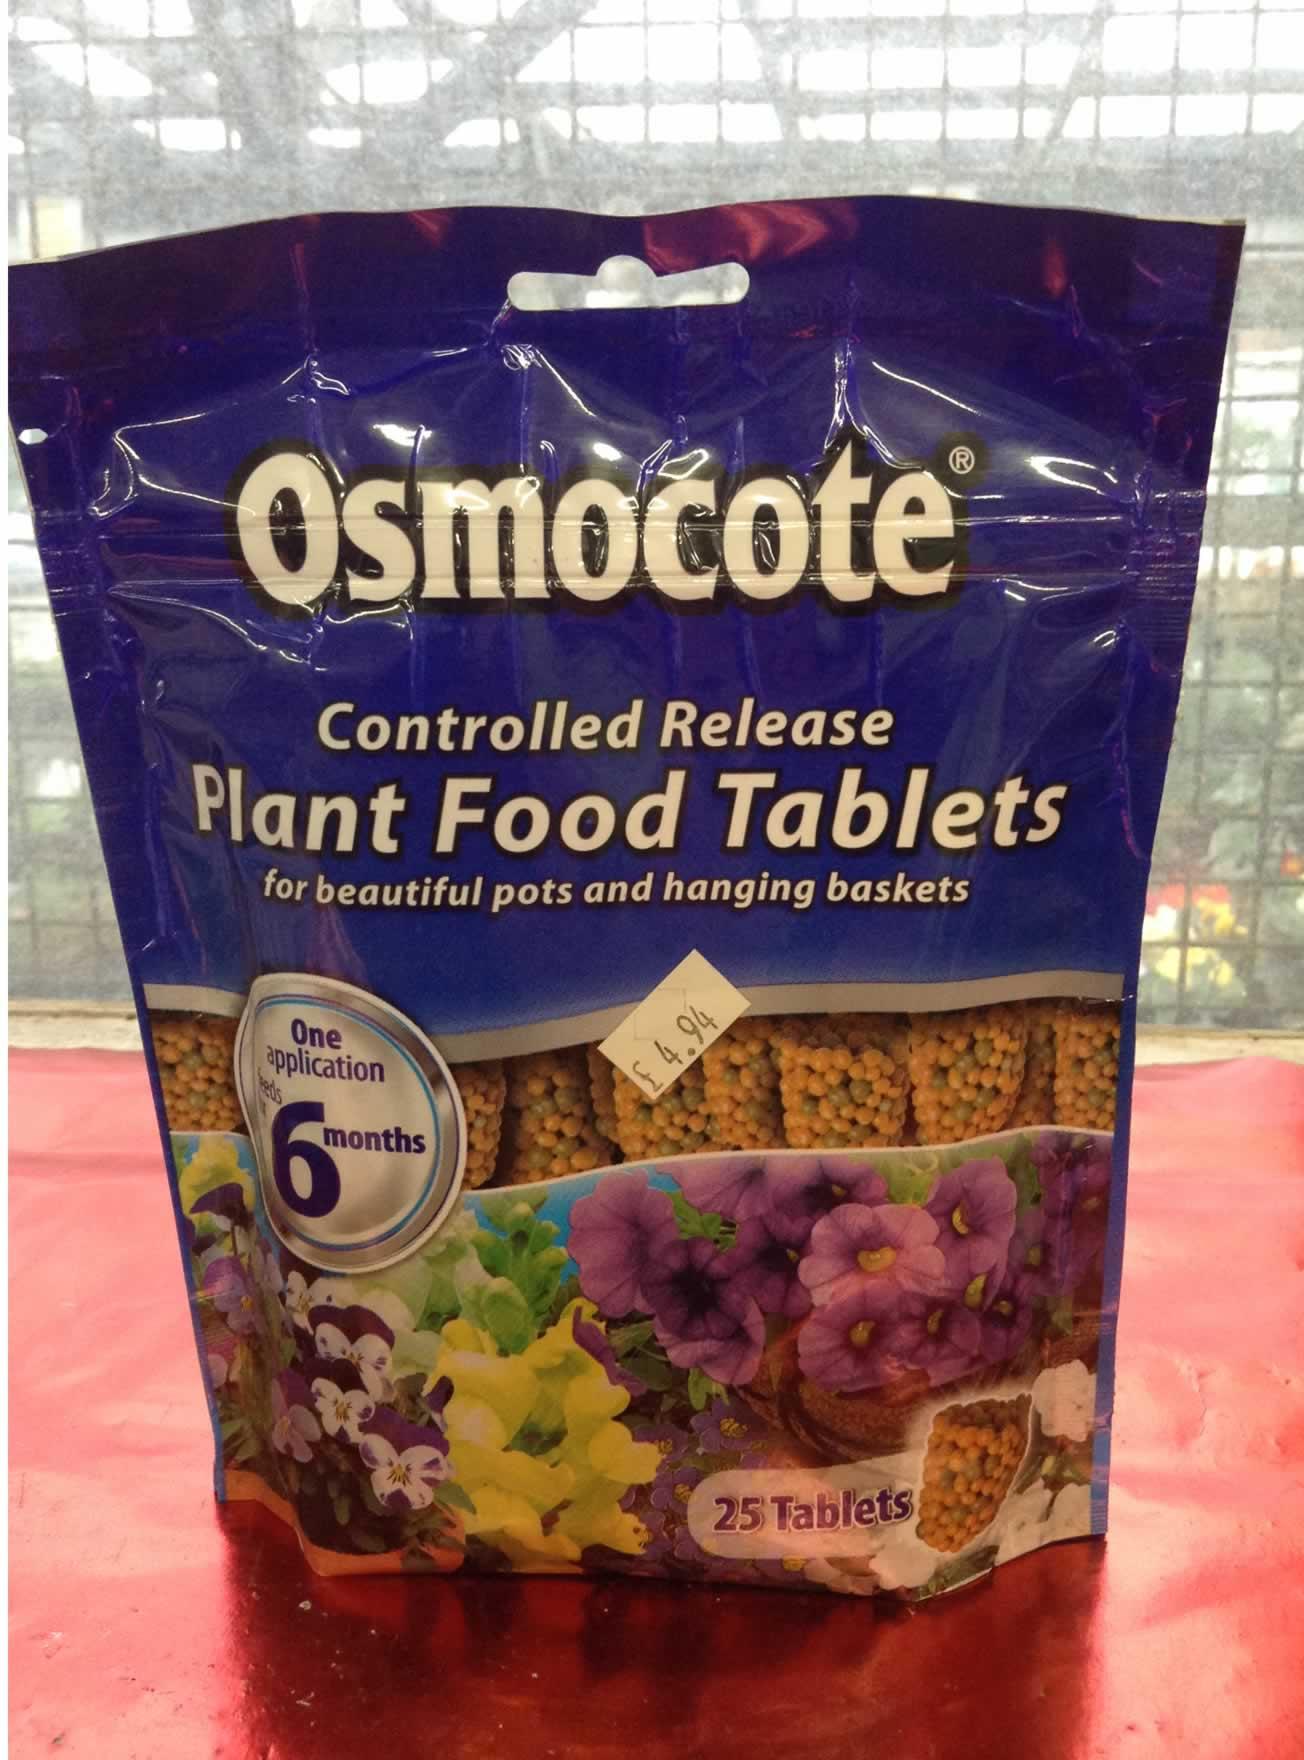 Osmocote Plant Food Tablets